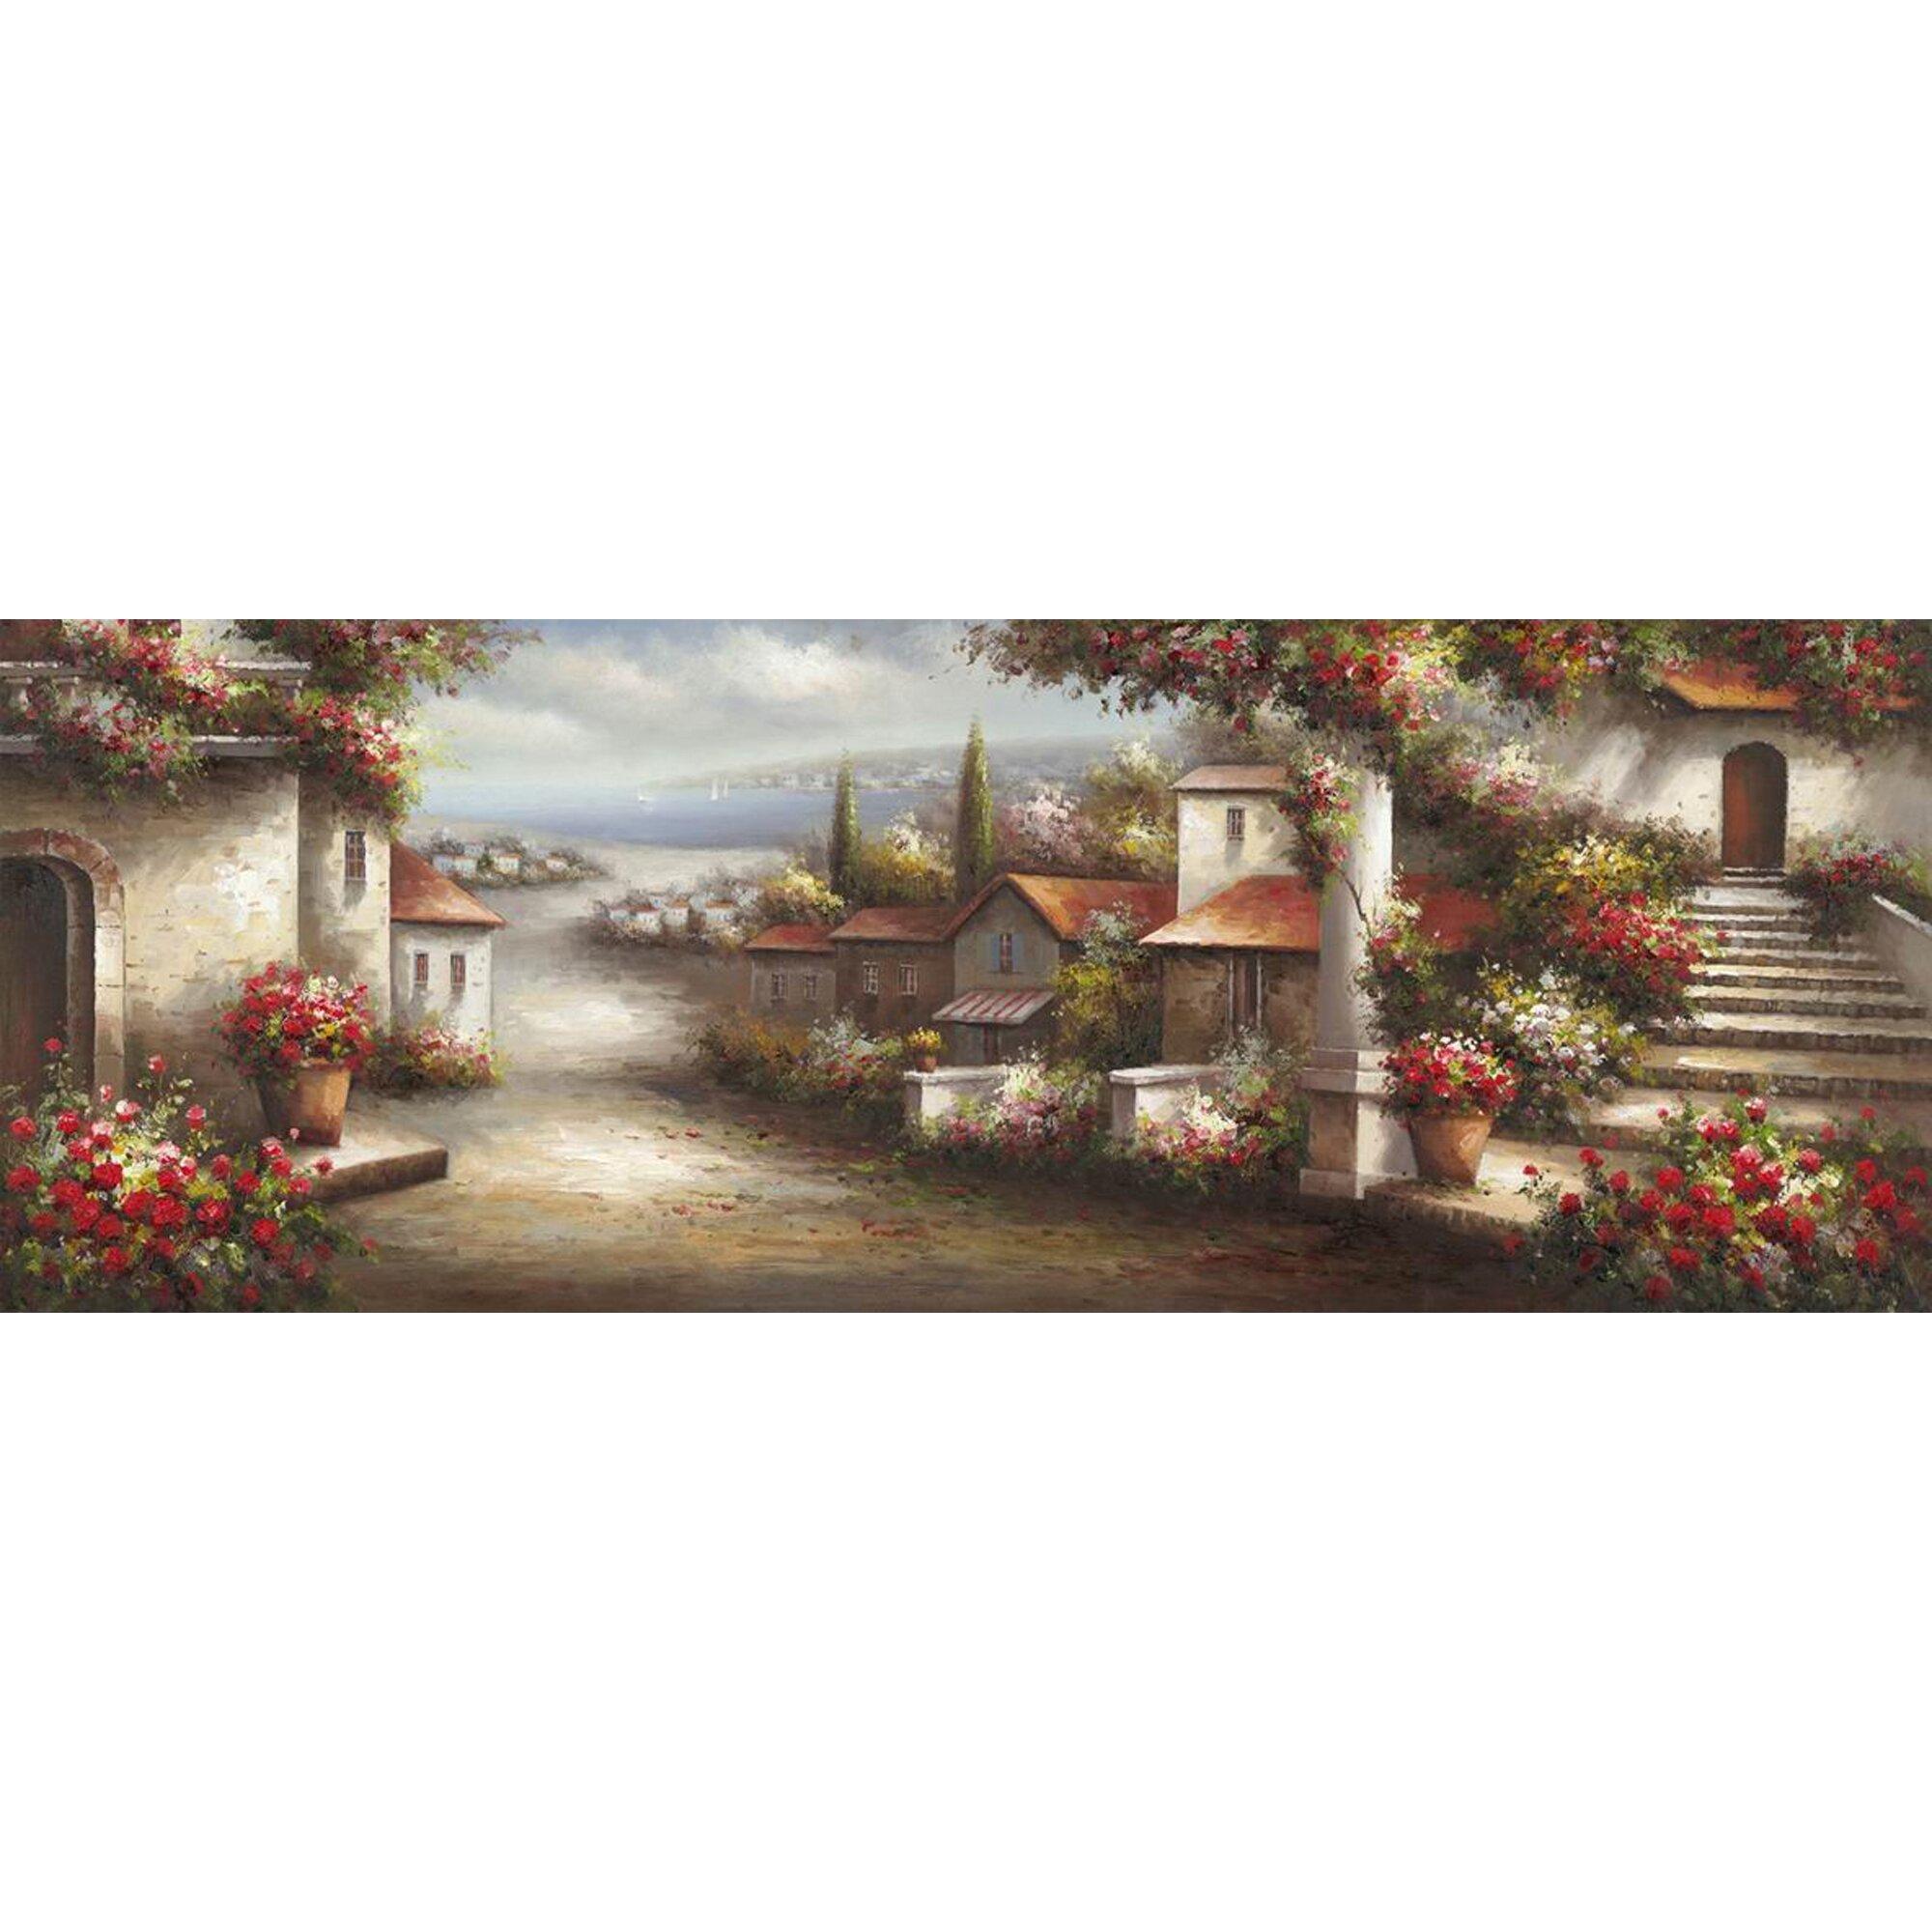 Yosemite Home Decor Revealed Artwork European Village 1